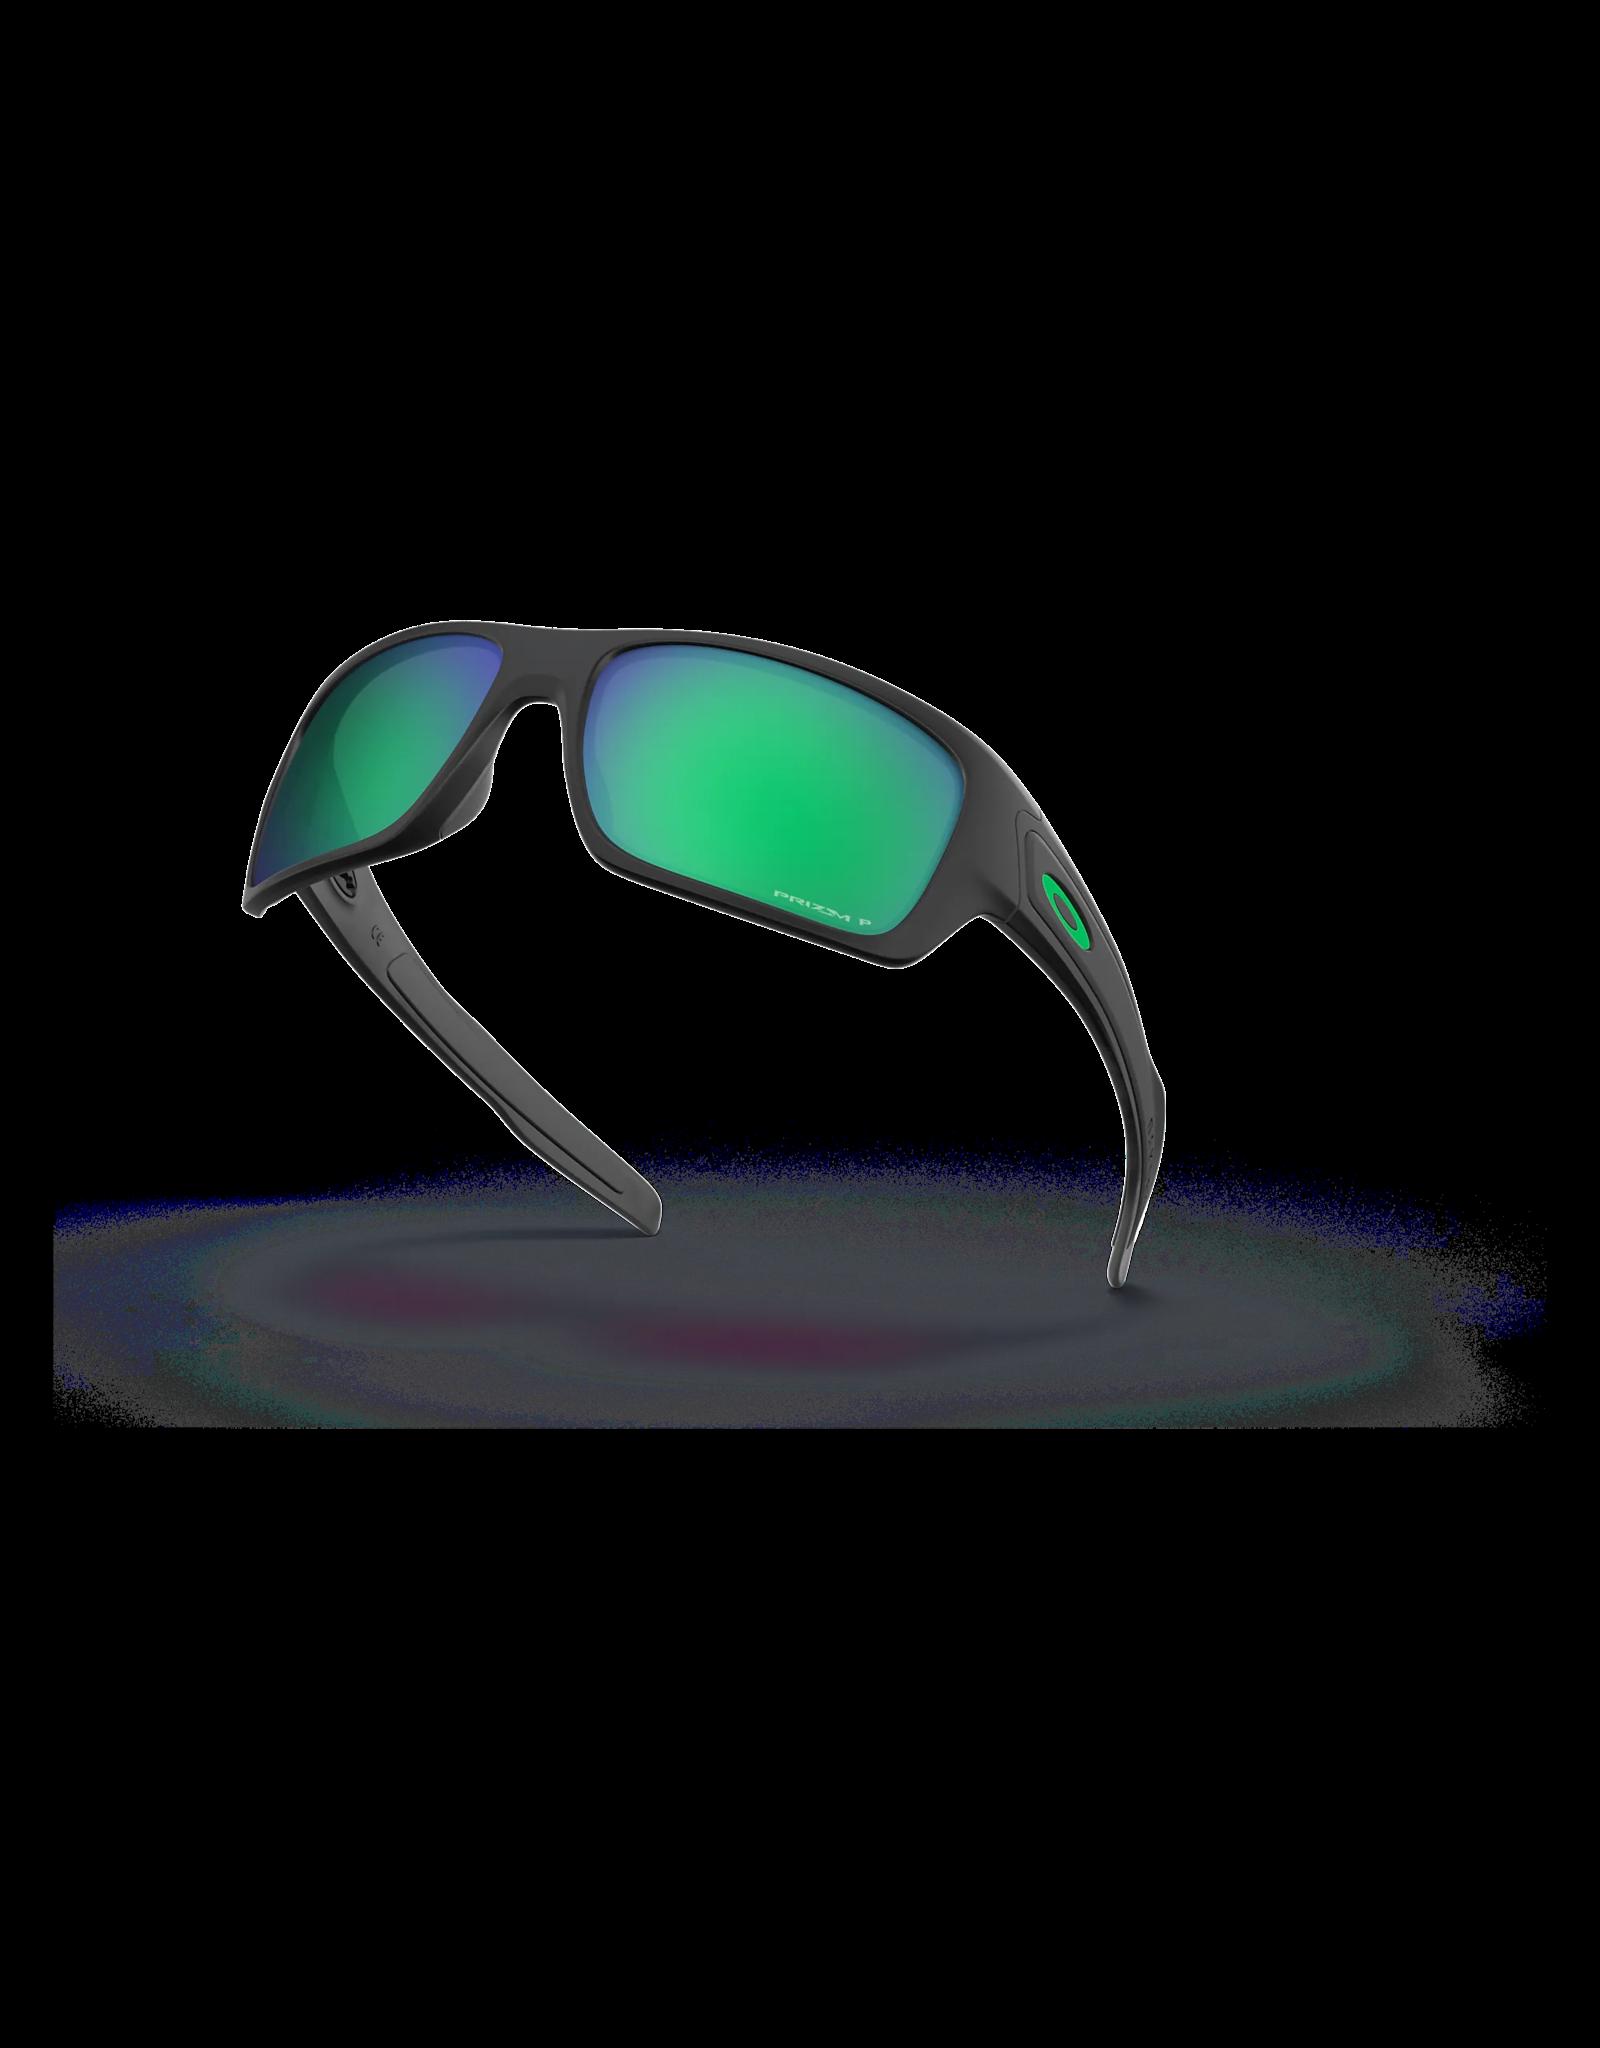 OAKLEY Oakley Turbine matte black prizm jade iridium polarized sun glasses